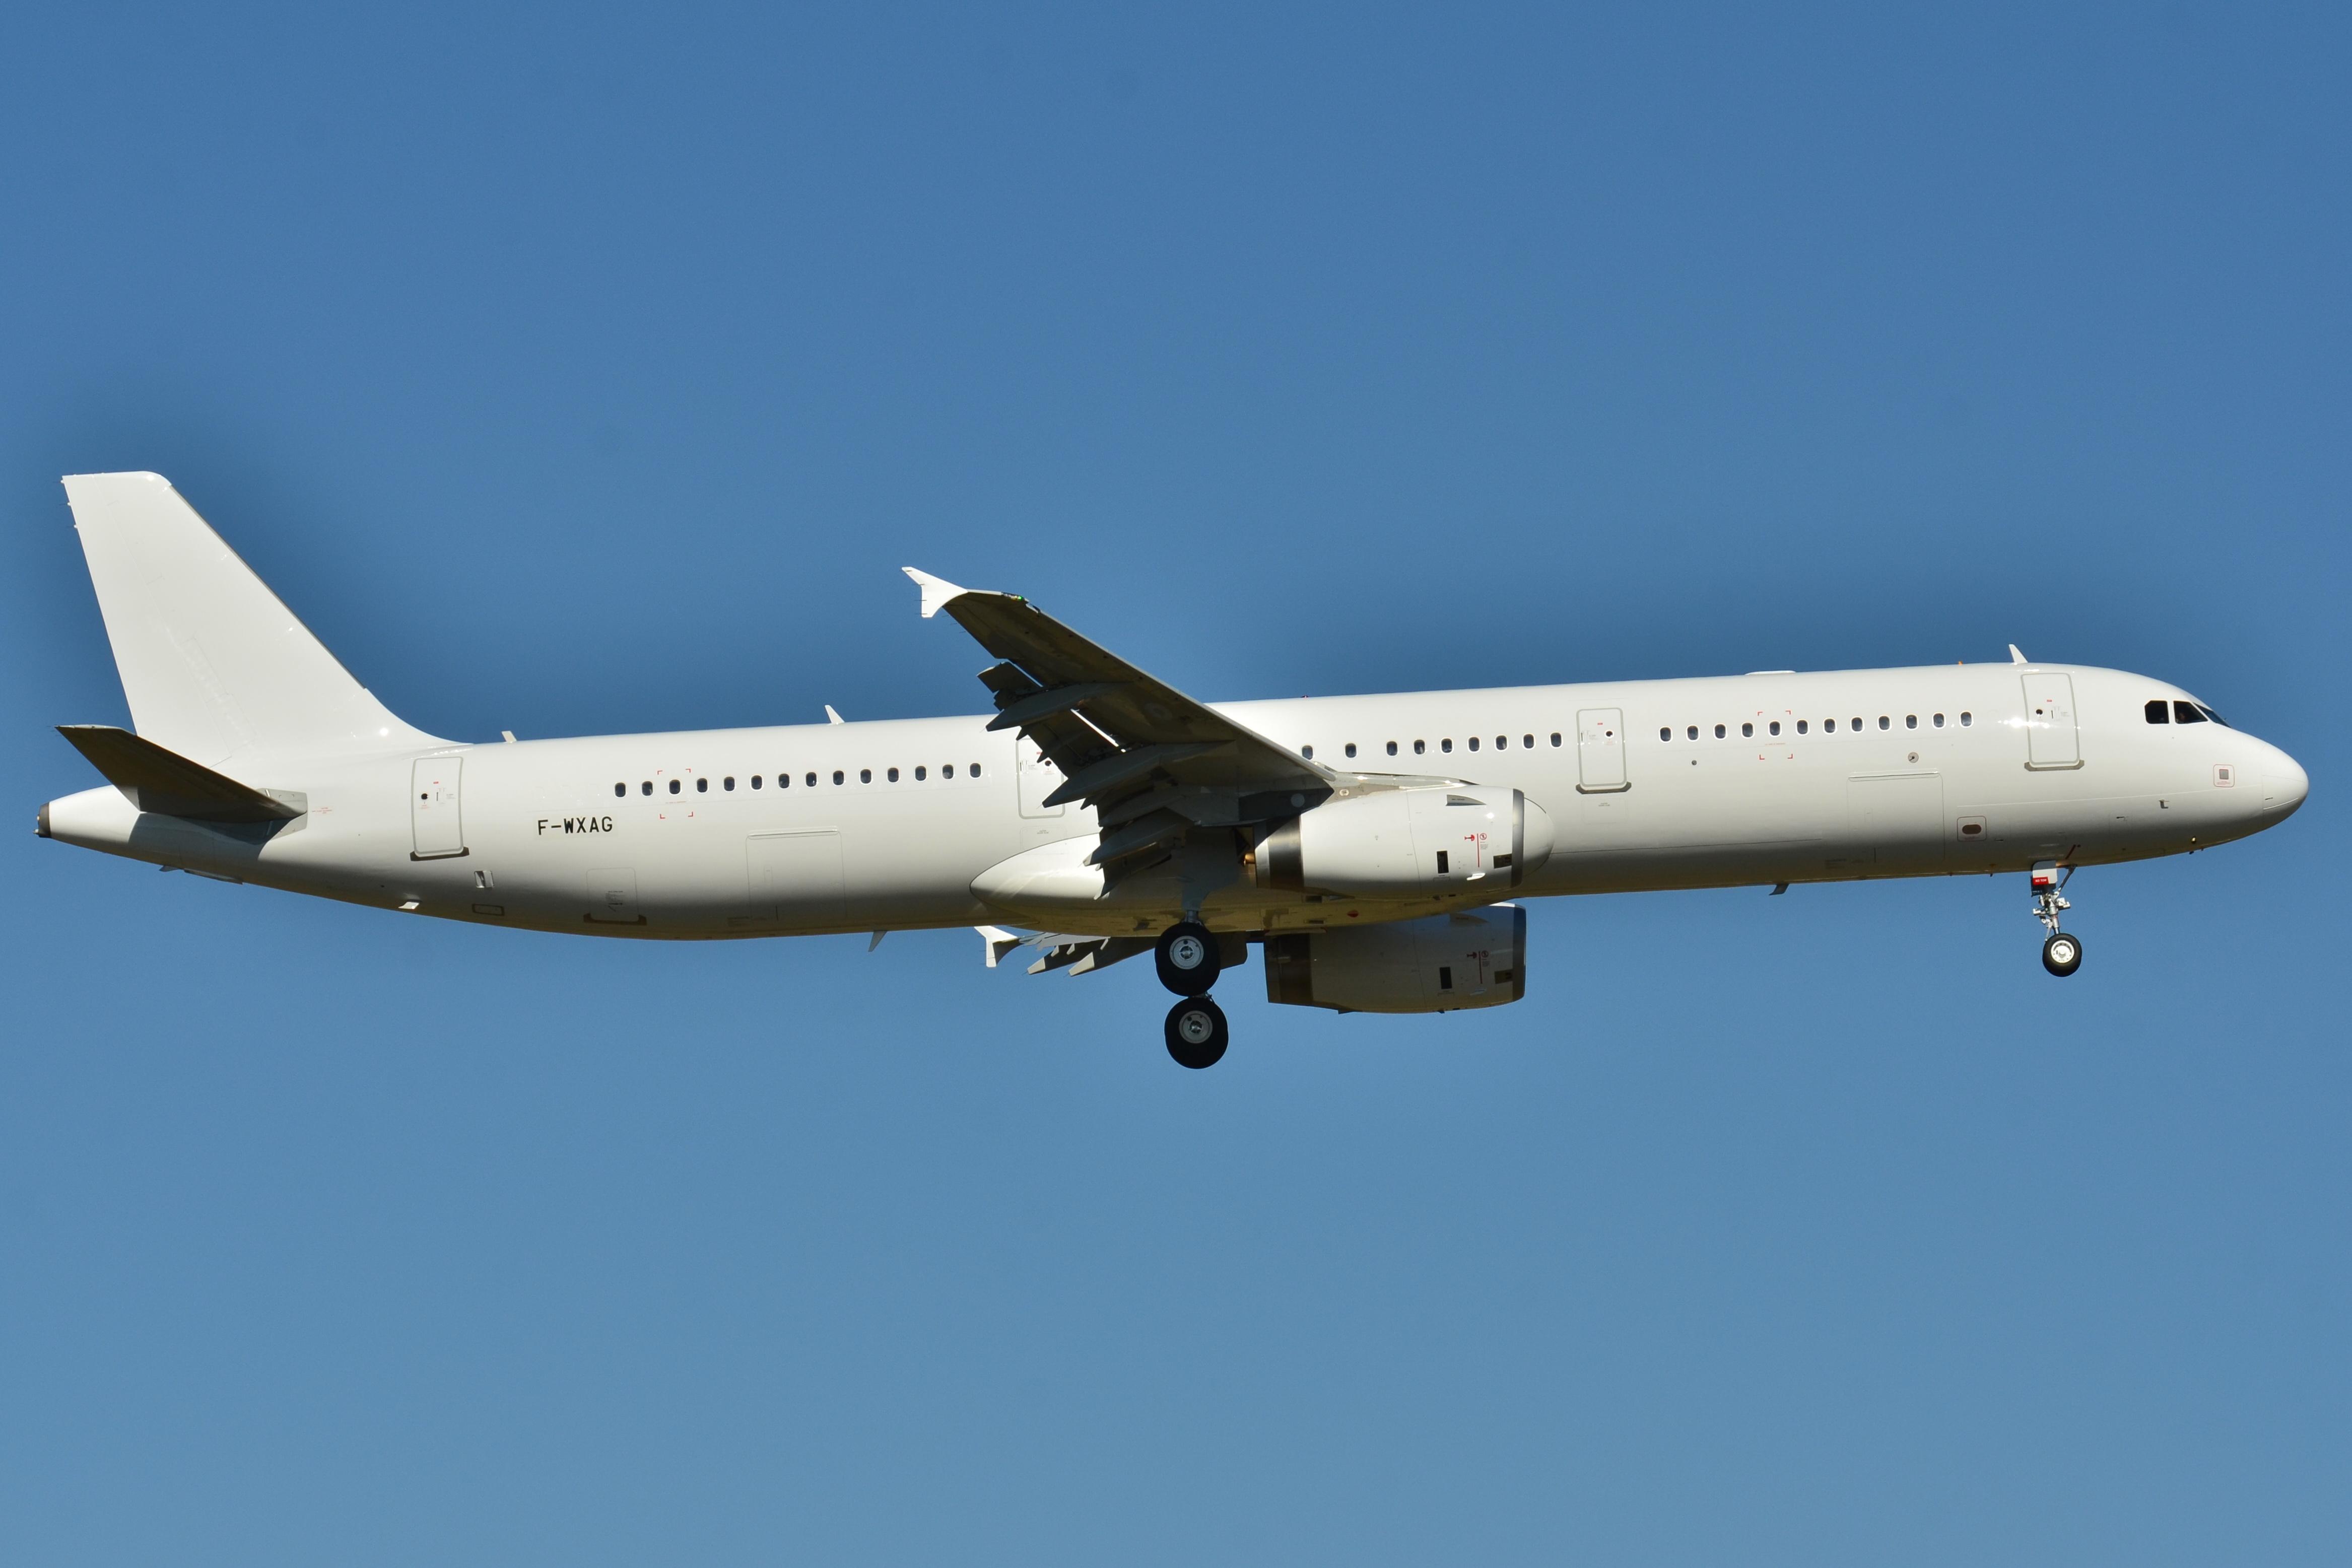 Airbus A321 211 Seating Airbus A321 200 Condor N585nk